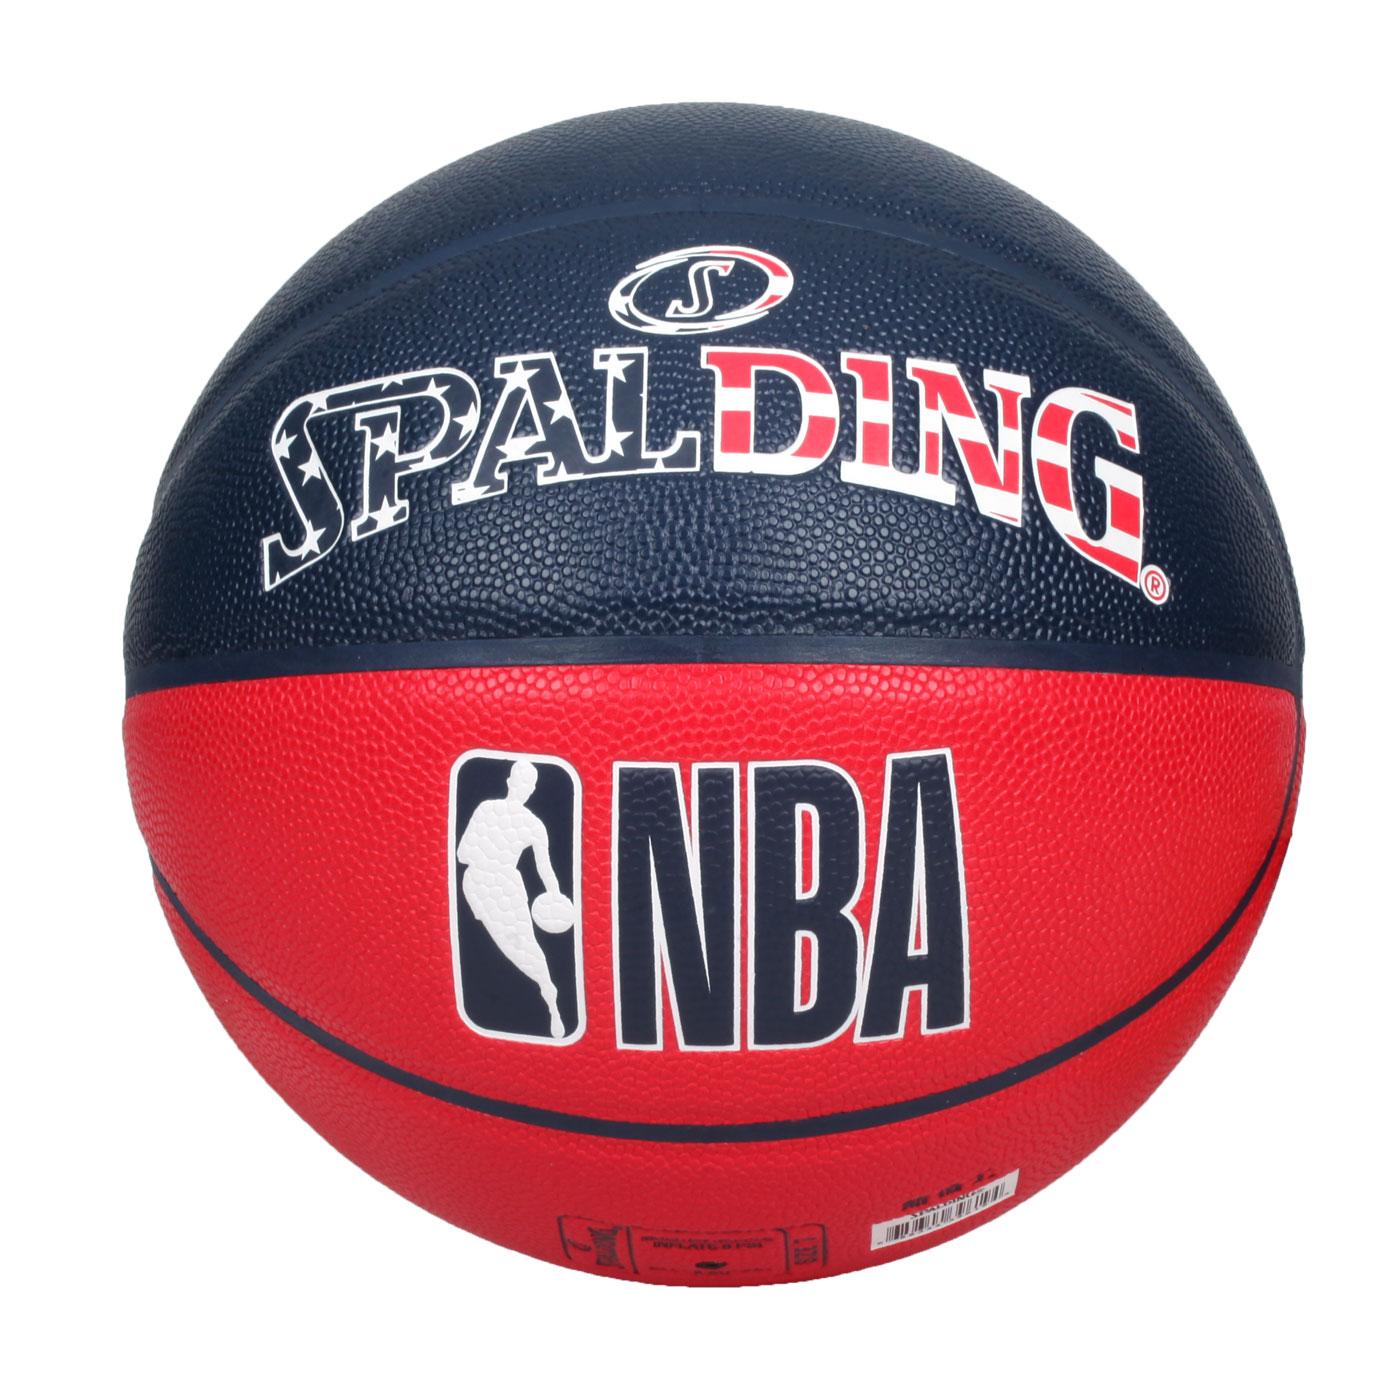 SPALDING NBA #7號合成皮籃球 SPA39619  SPA76487 - 丈青紅白